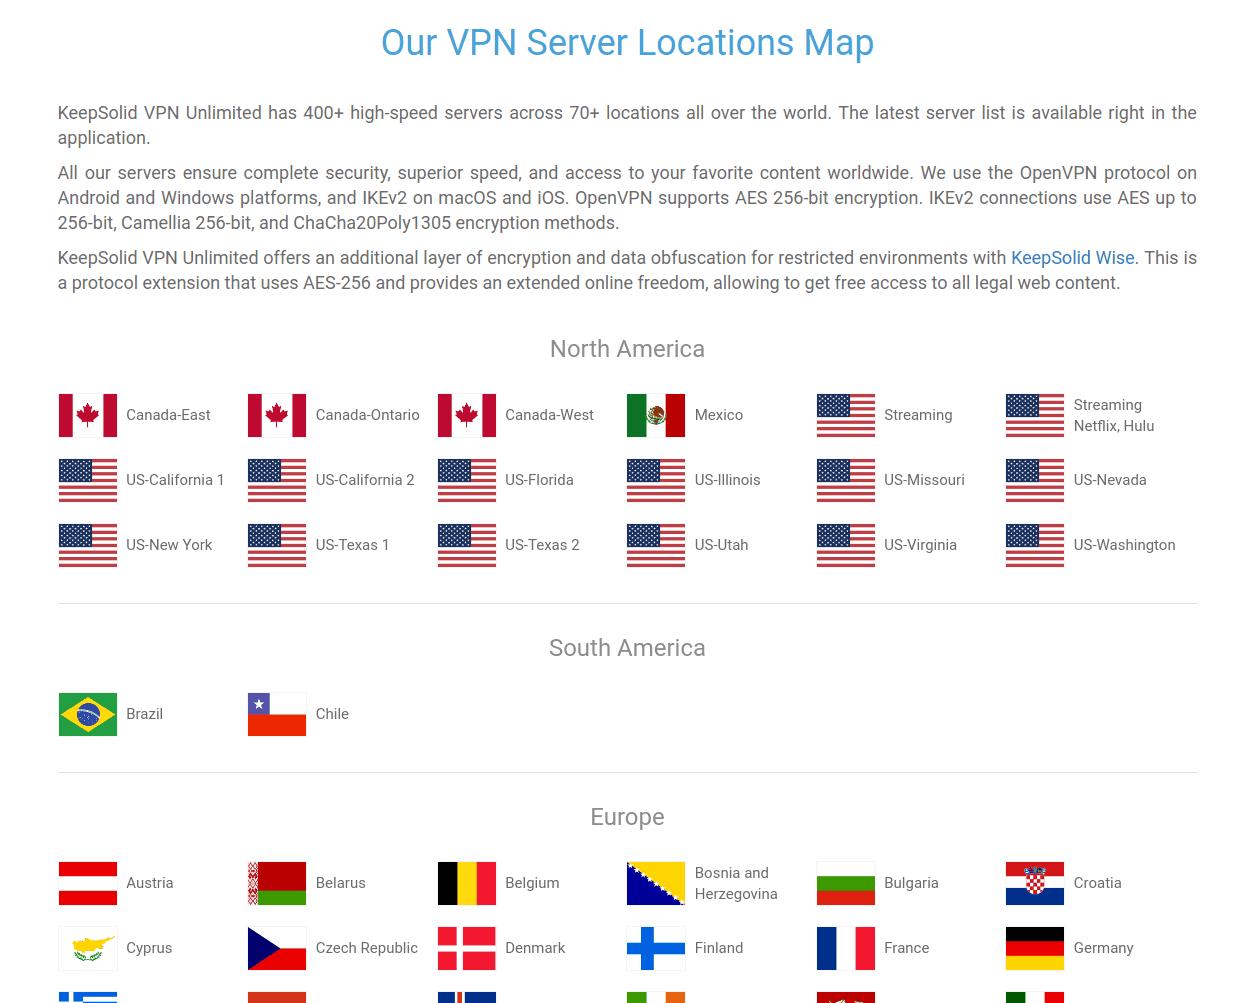 KeepSolid VPN Unlimited Global Coverage